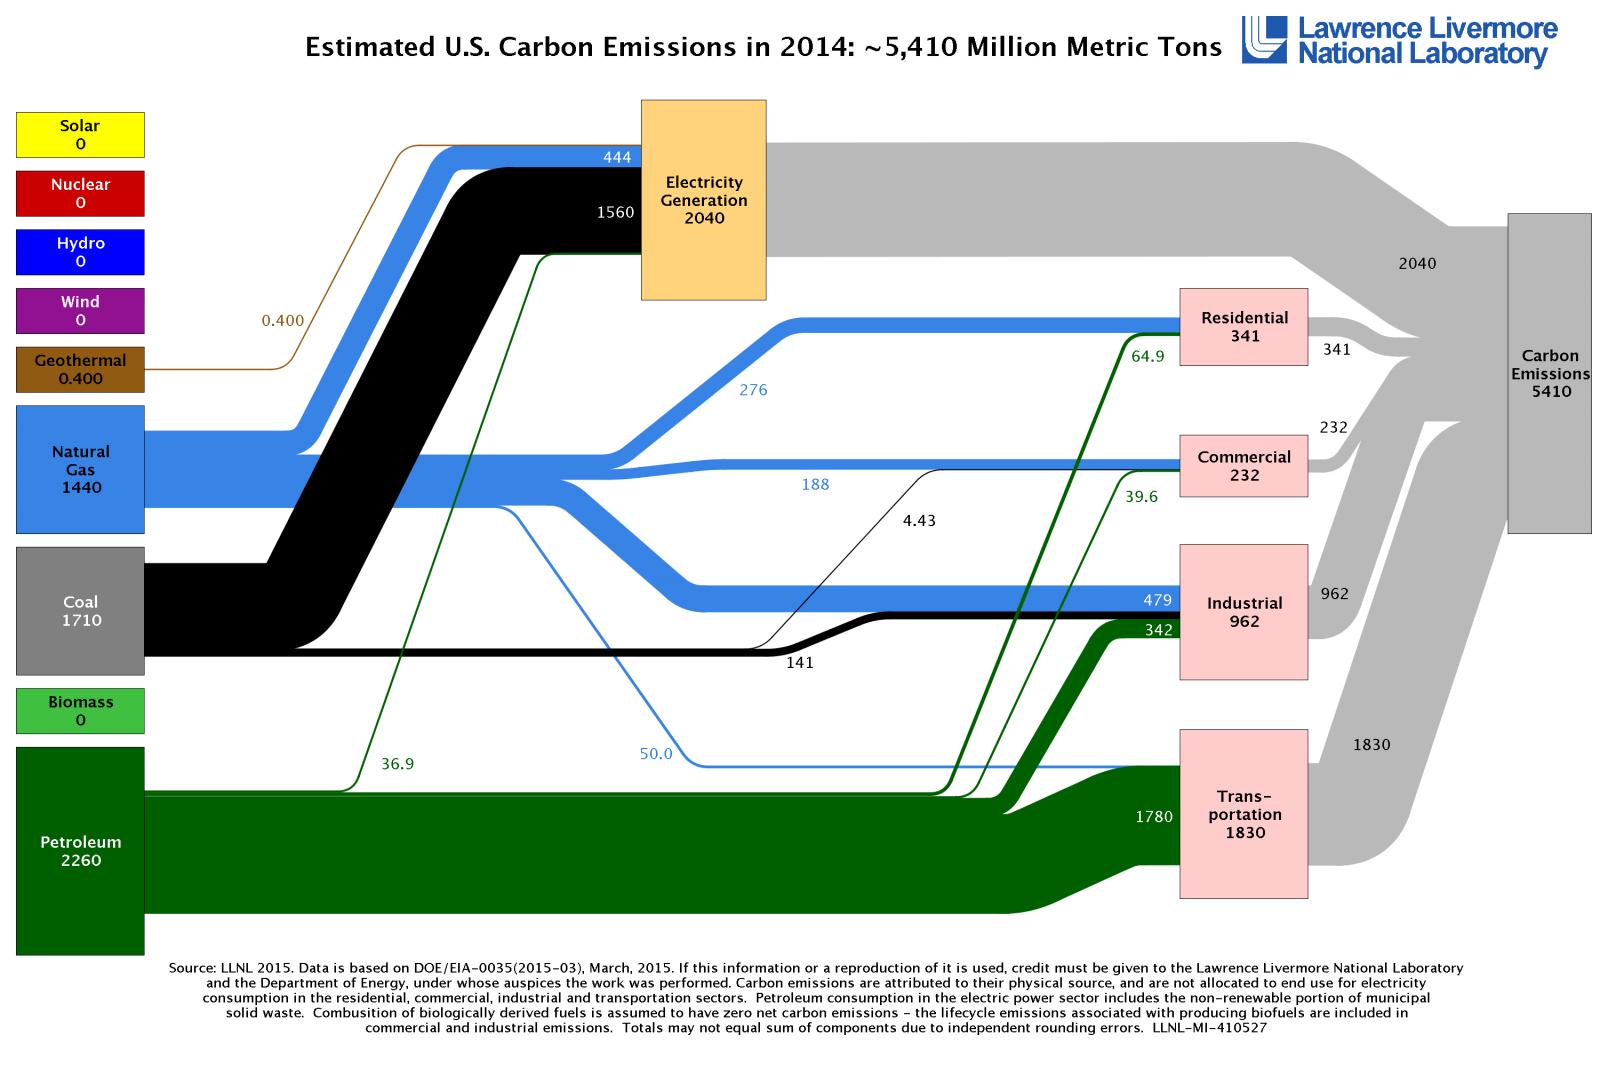 CO2 Kohlendioxid Energieerzeugung USA 2014